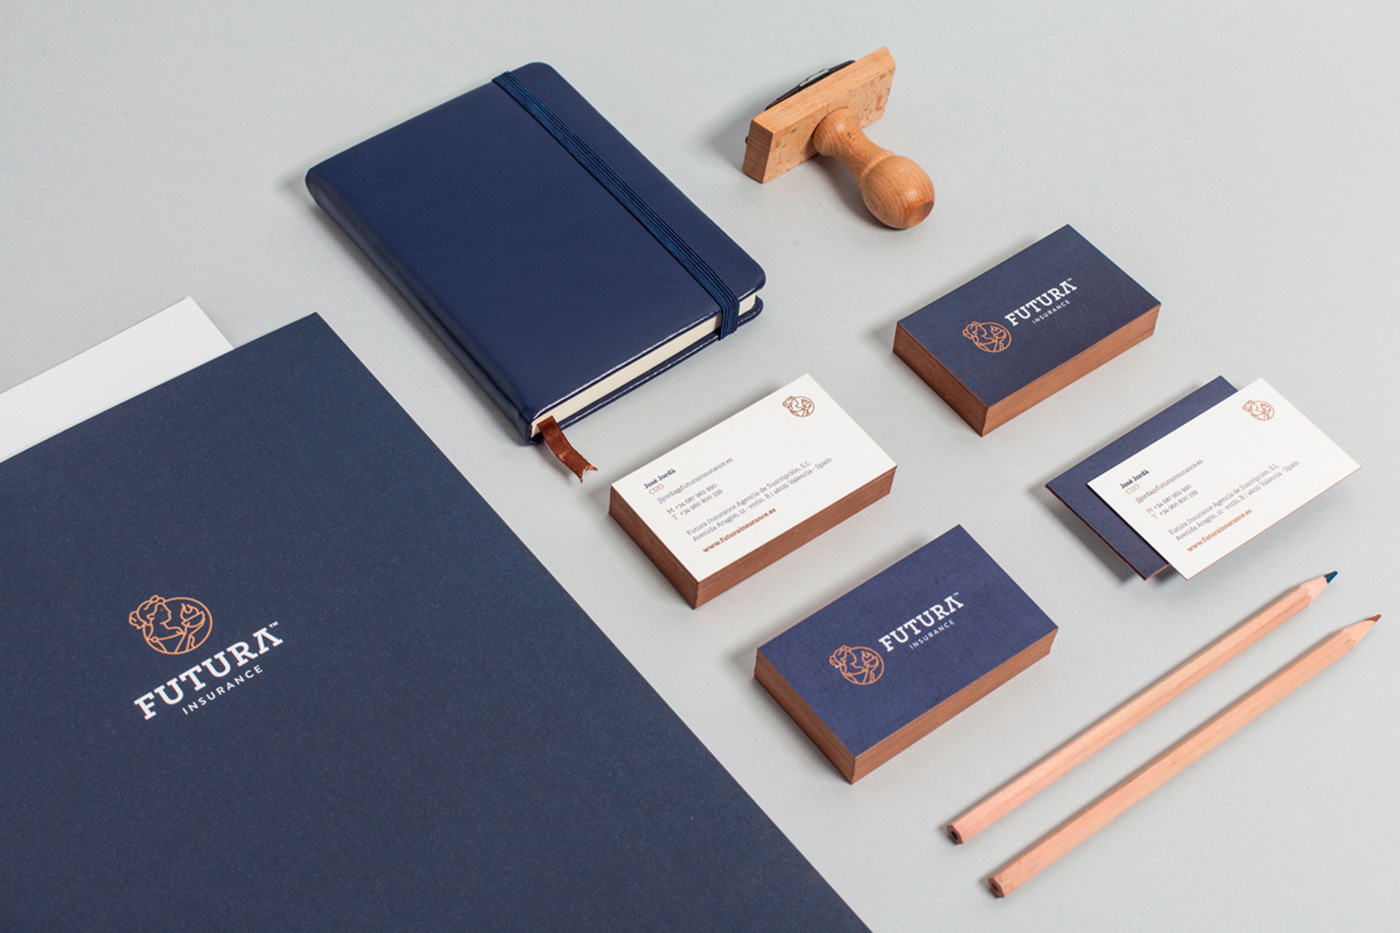 pixelarte-estudio-diseno-grafico-papeleria_corporativa-Futura-insurance